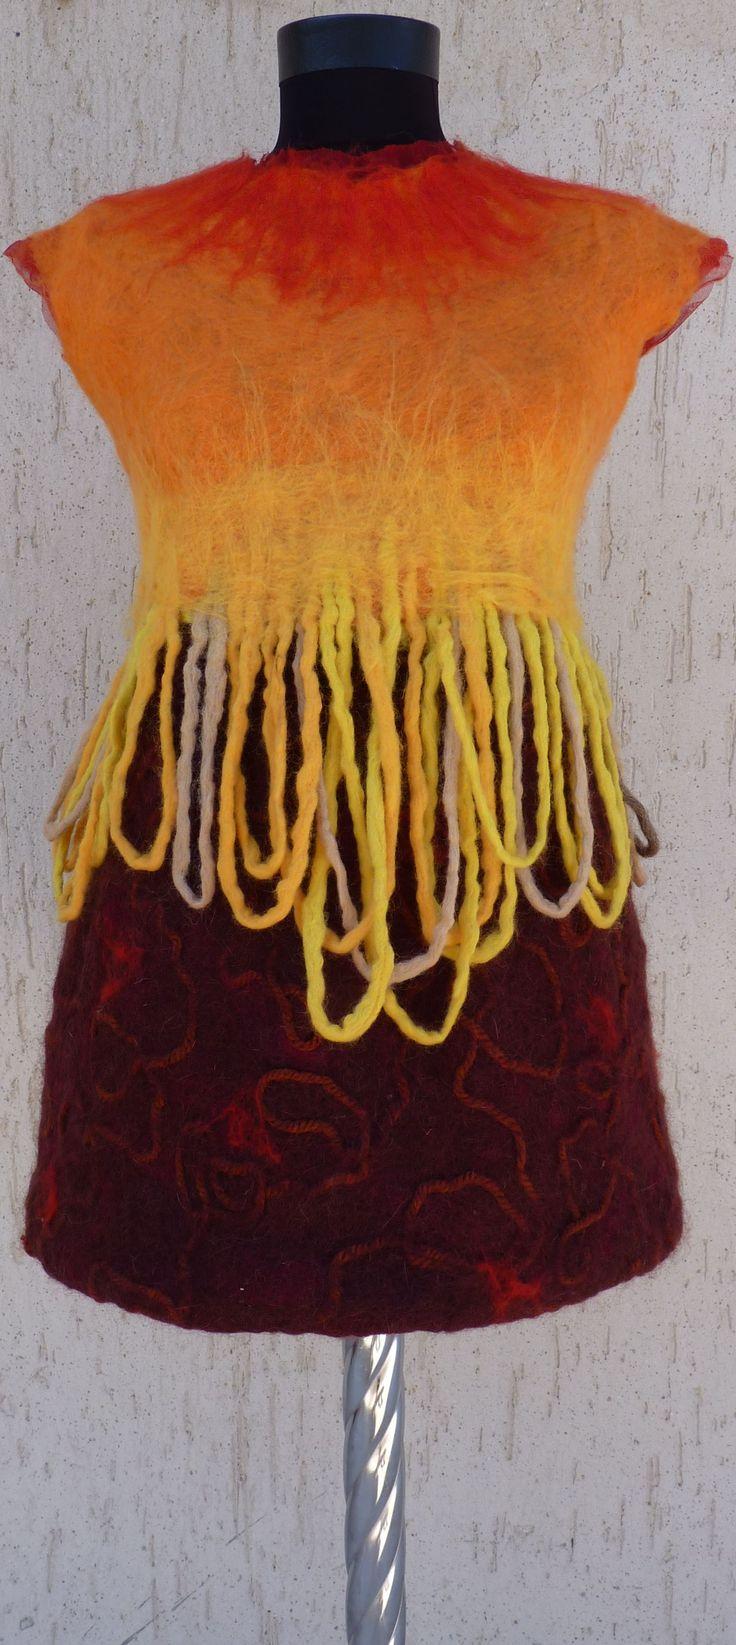 seamless felted garment by Hulya ILGIN